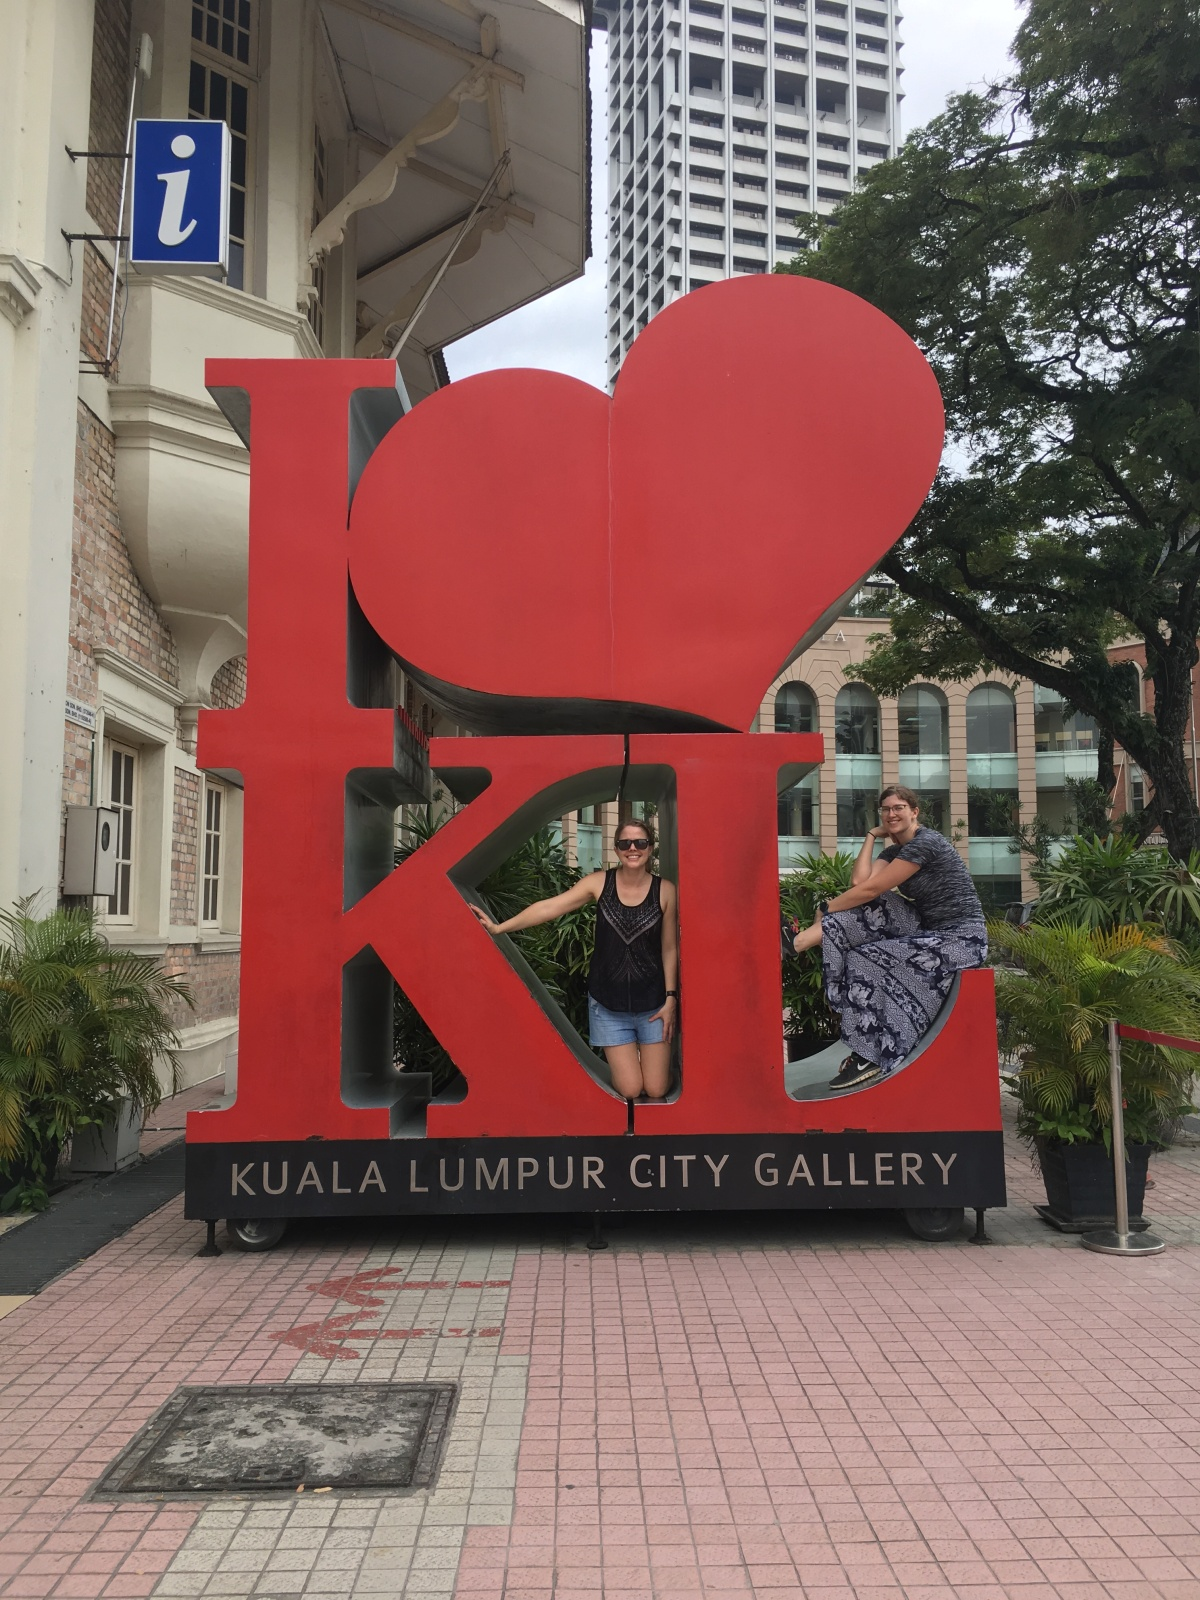 Where in the world in KualaLumpur?